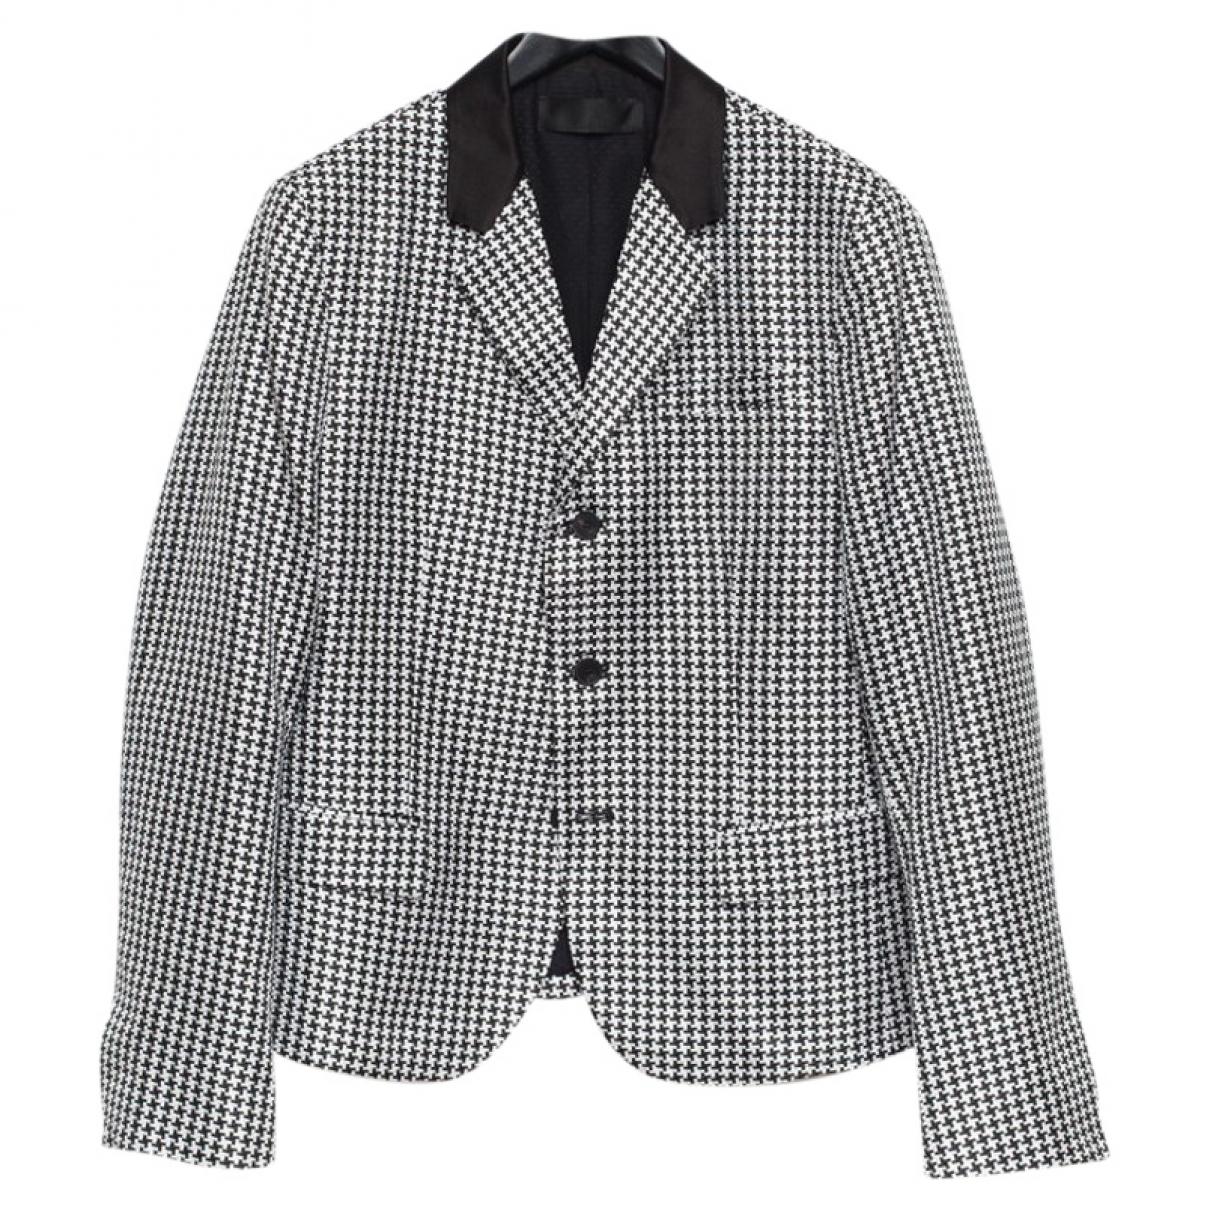 Haider Ackermann \N White Cotton jacket  for Men L International